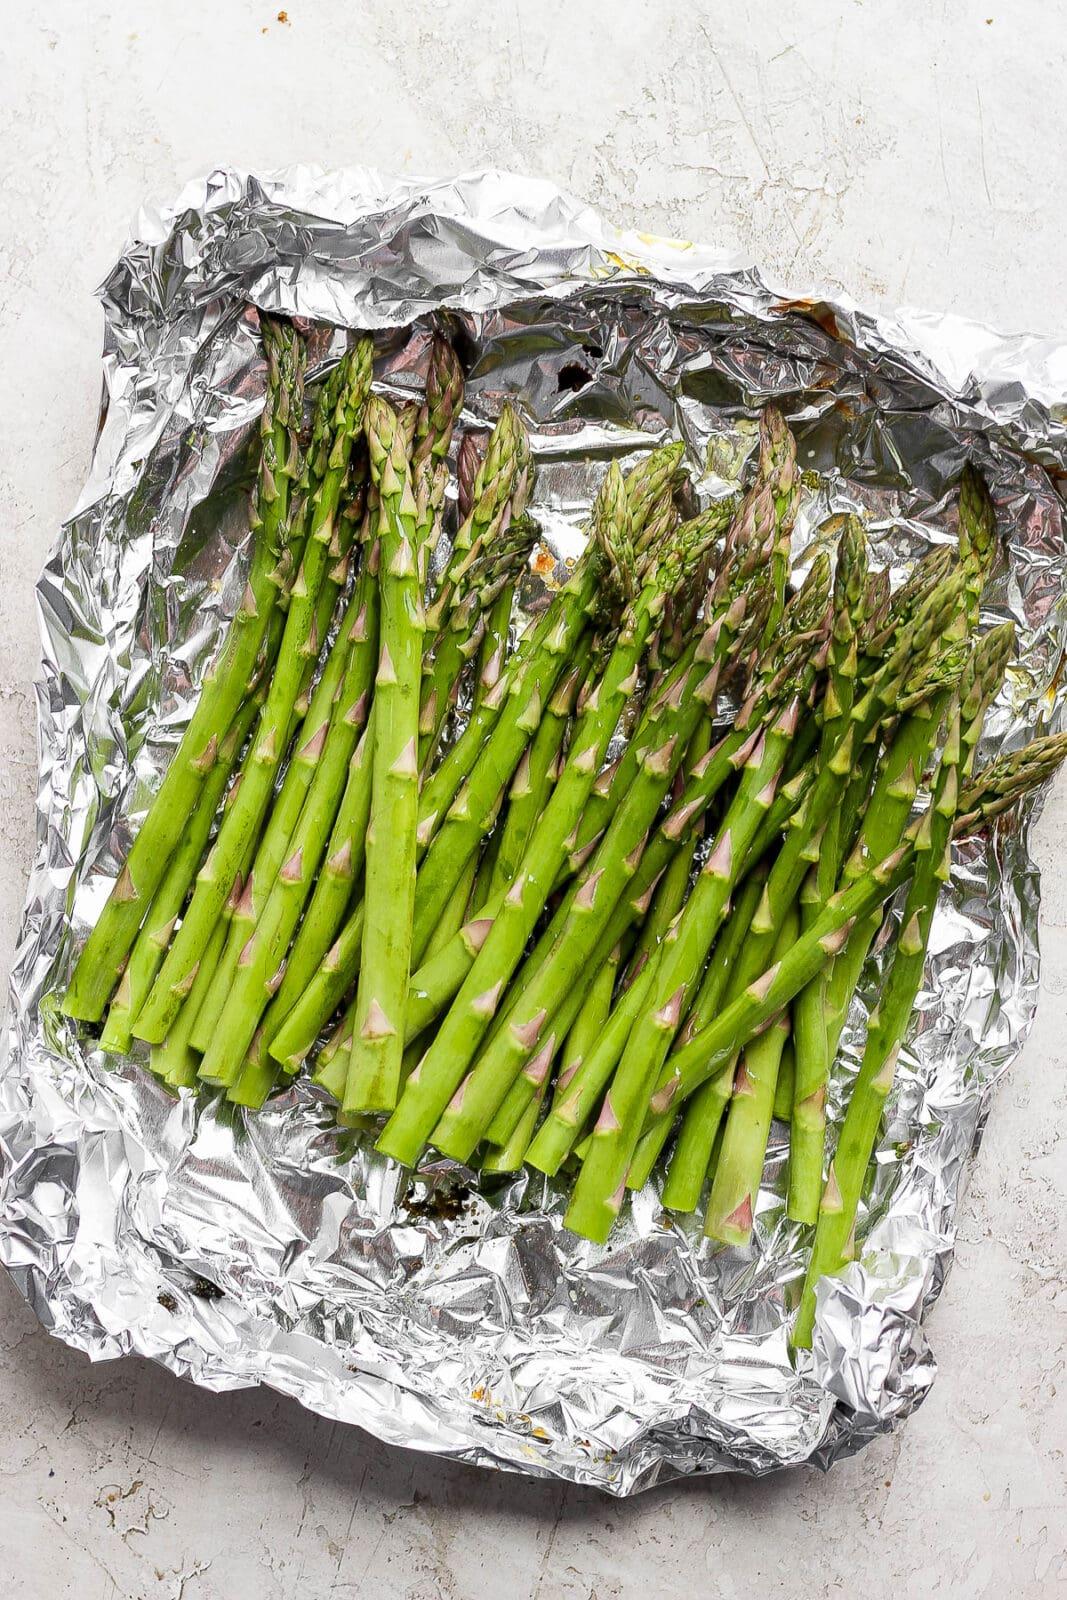 Asparagus in an aluminum foil boat.